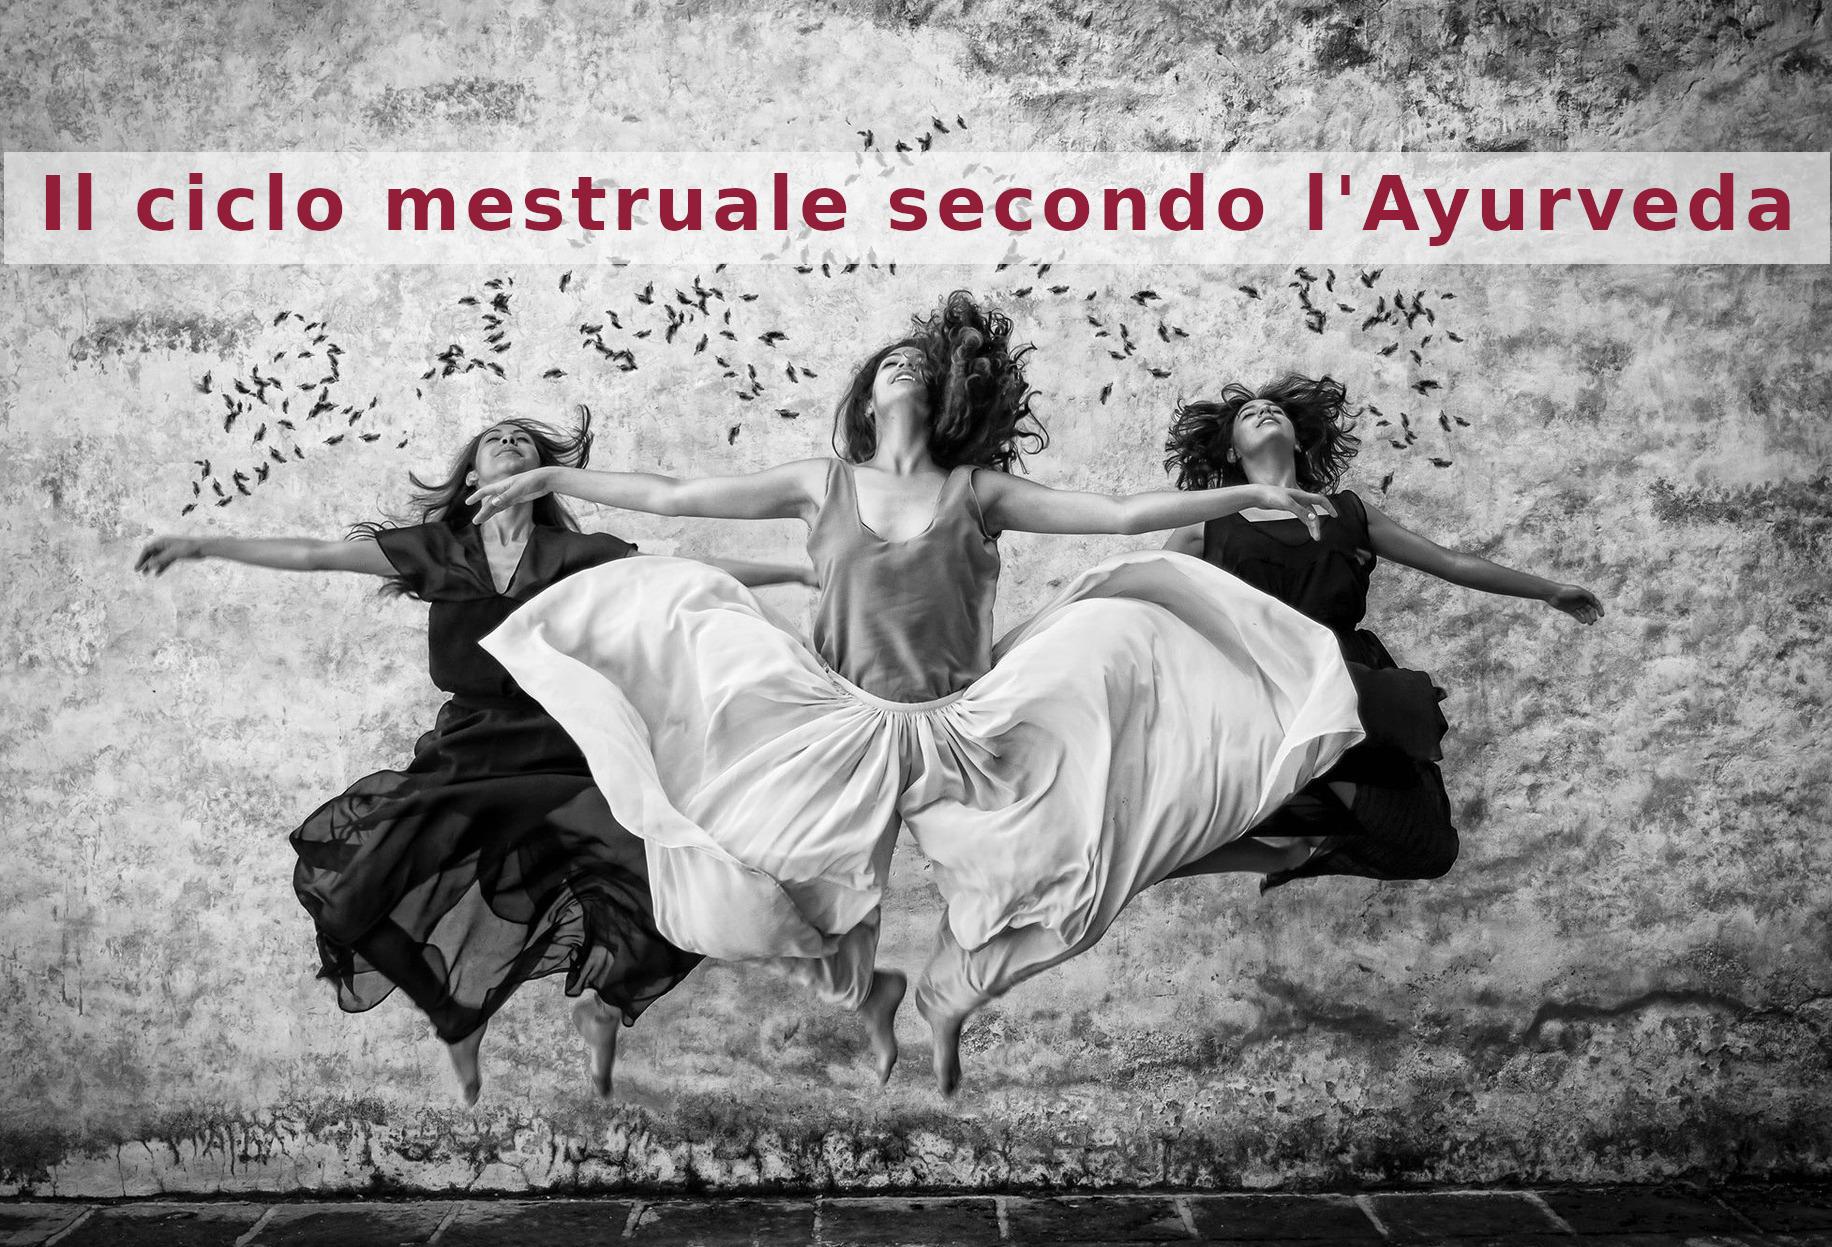 Il ciclo mestruale secondo l'Ayurveda